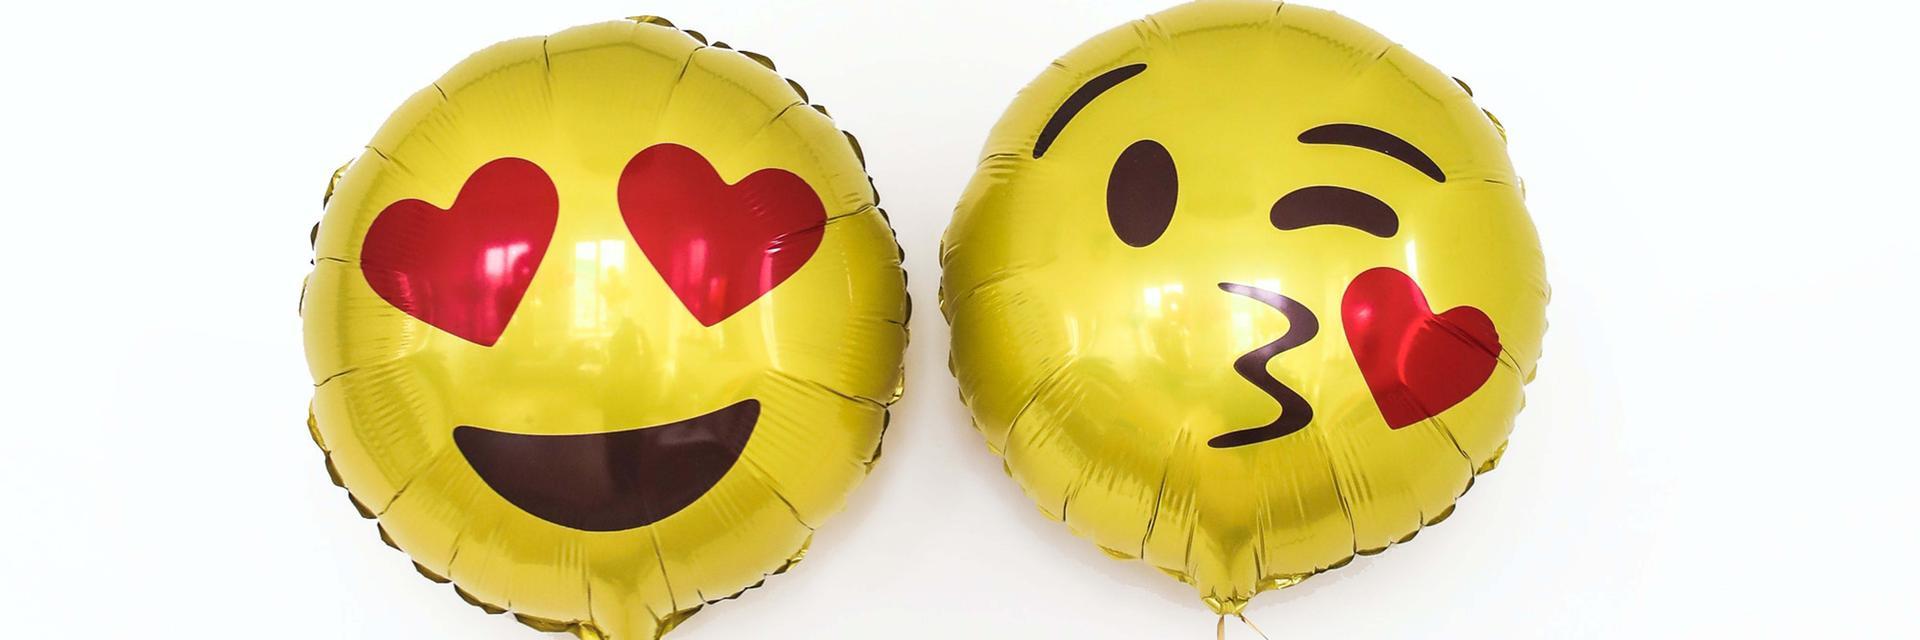 Balloon emojis